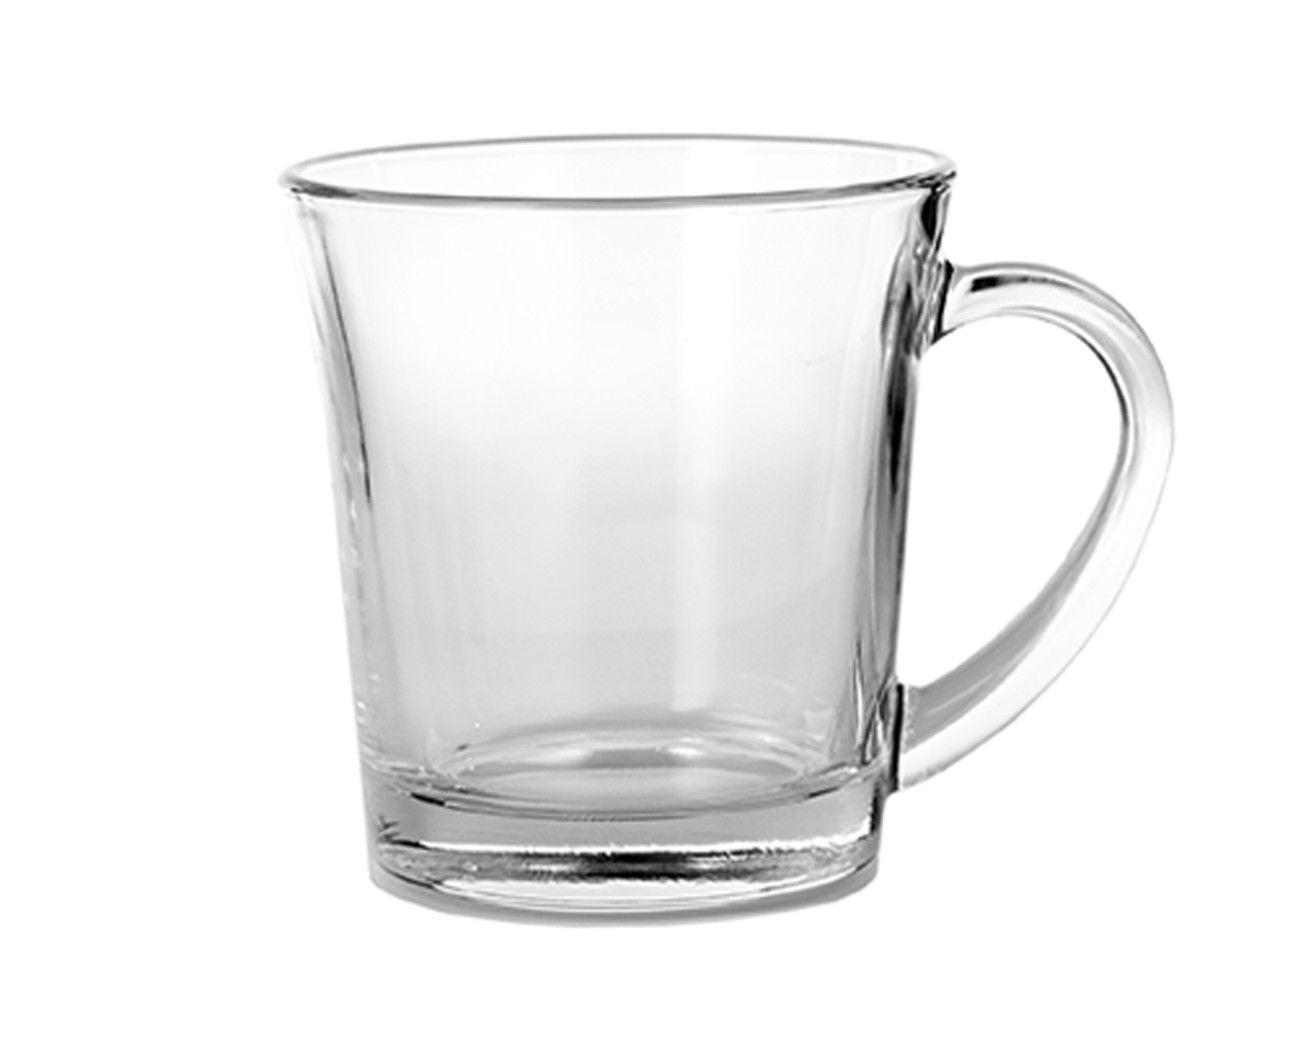 GLASS COFFEE/LATTE MUG-14.5OZ - New | Stokes Inc. Canada\'s Online ...